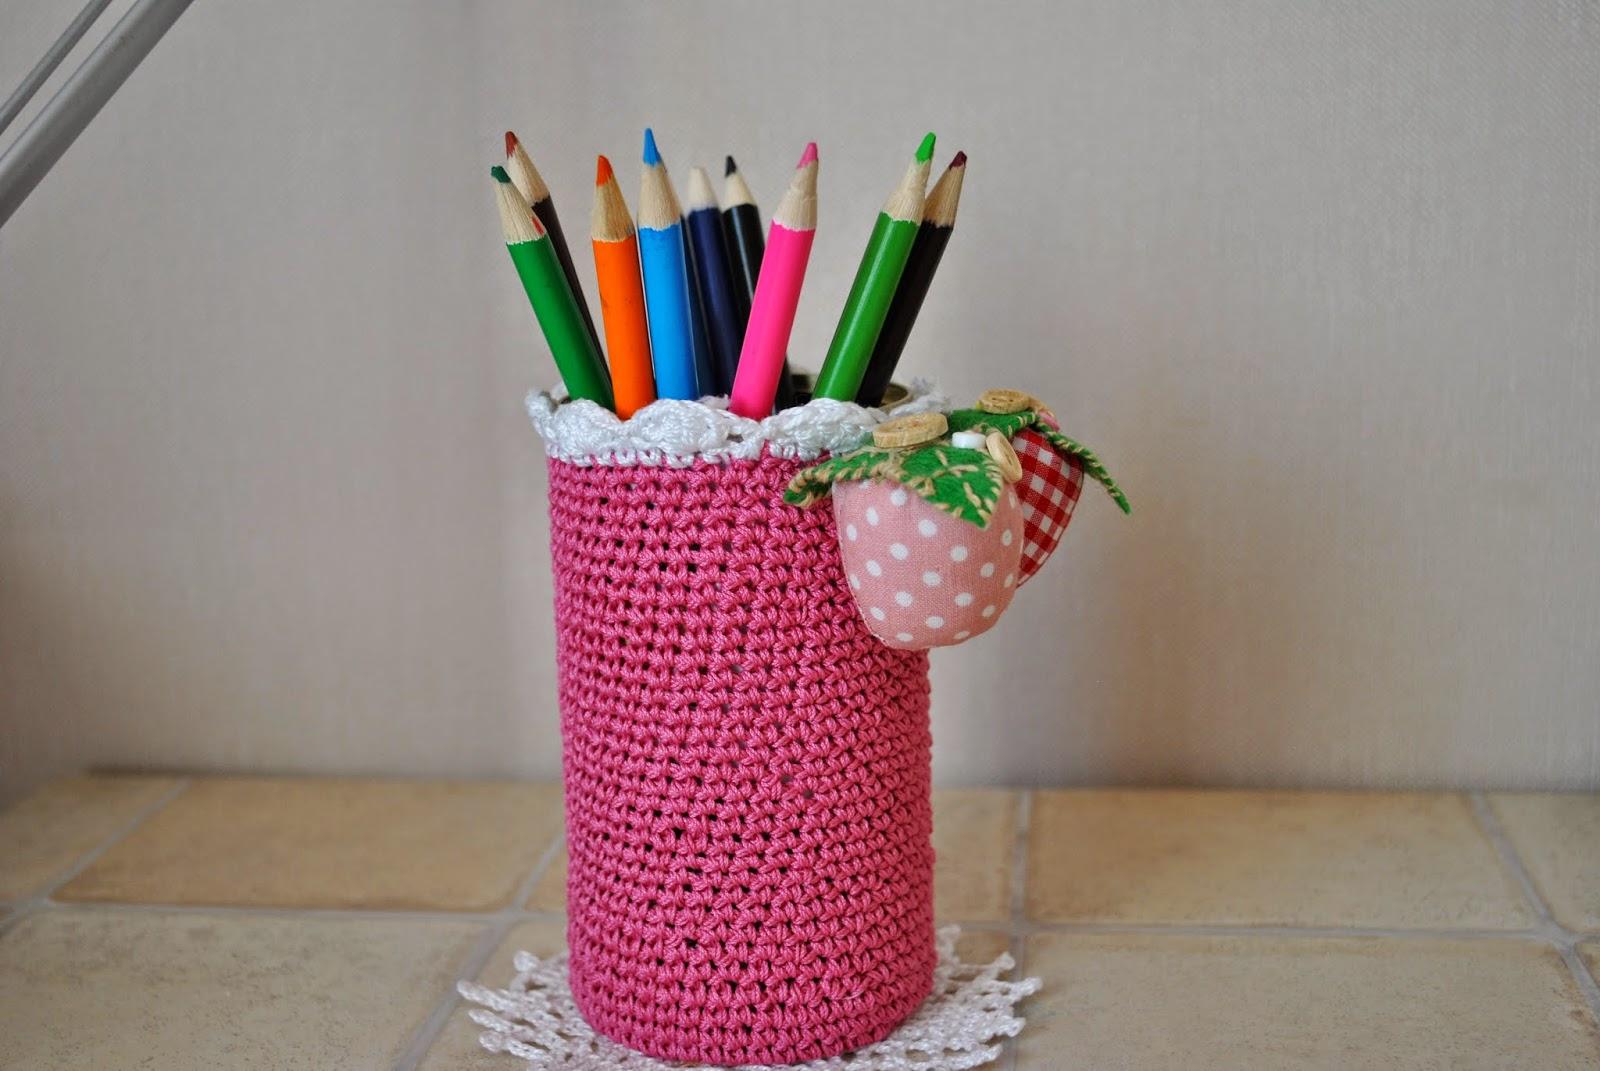 карандашница, вязаная крючком,Pencil, craft, crochet,strawberry, handmade, color,